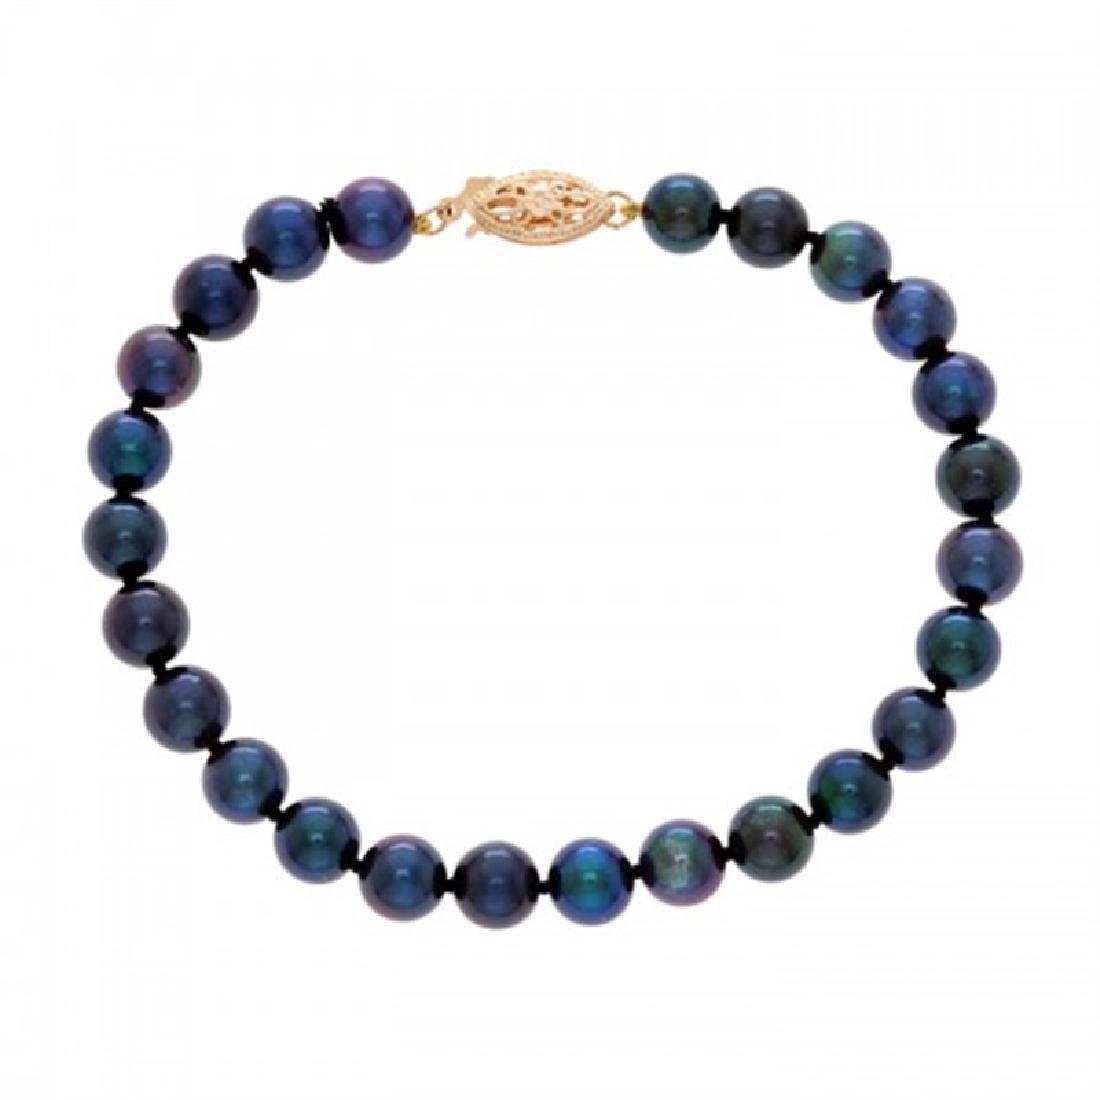 6.0-6.5mm Japanese Akoya Black Pearl Bracelet